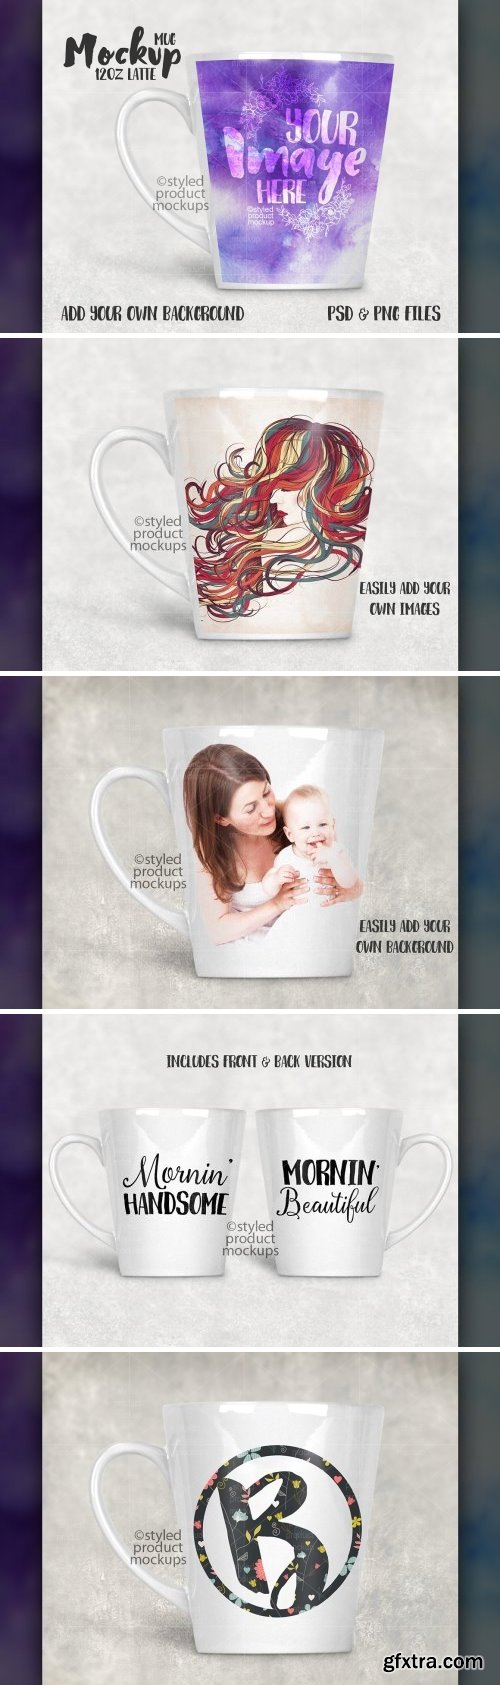 CM - 12 oz latte mug mockup 1602106